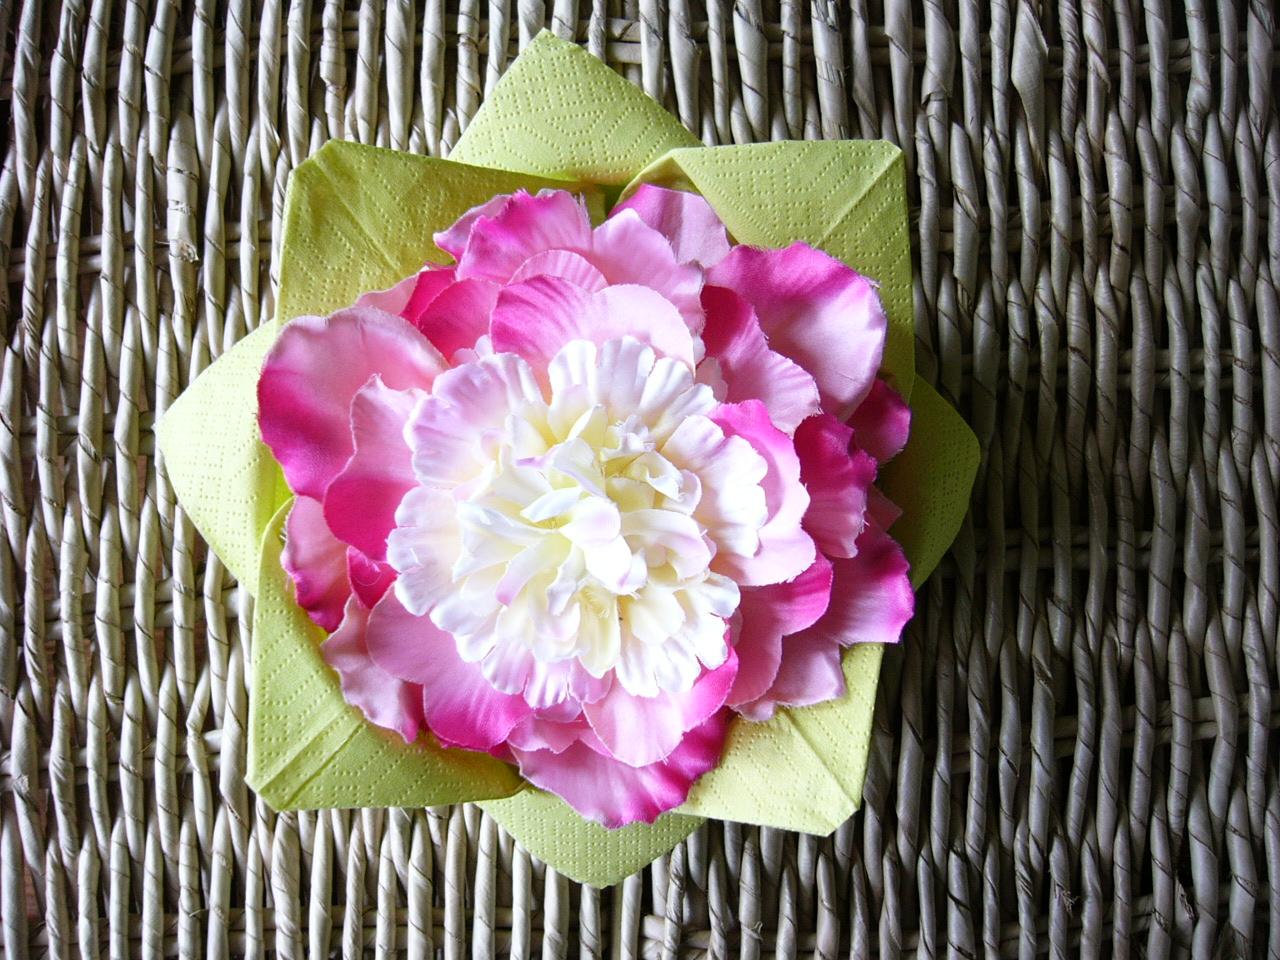 http://2.bp.blogspot.com/-oK3amx161gA/T5B2FwrhSTI/AAAAAAAAApA/zSPcYcuIoPM/s1600/lotus1.jpg